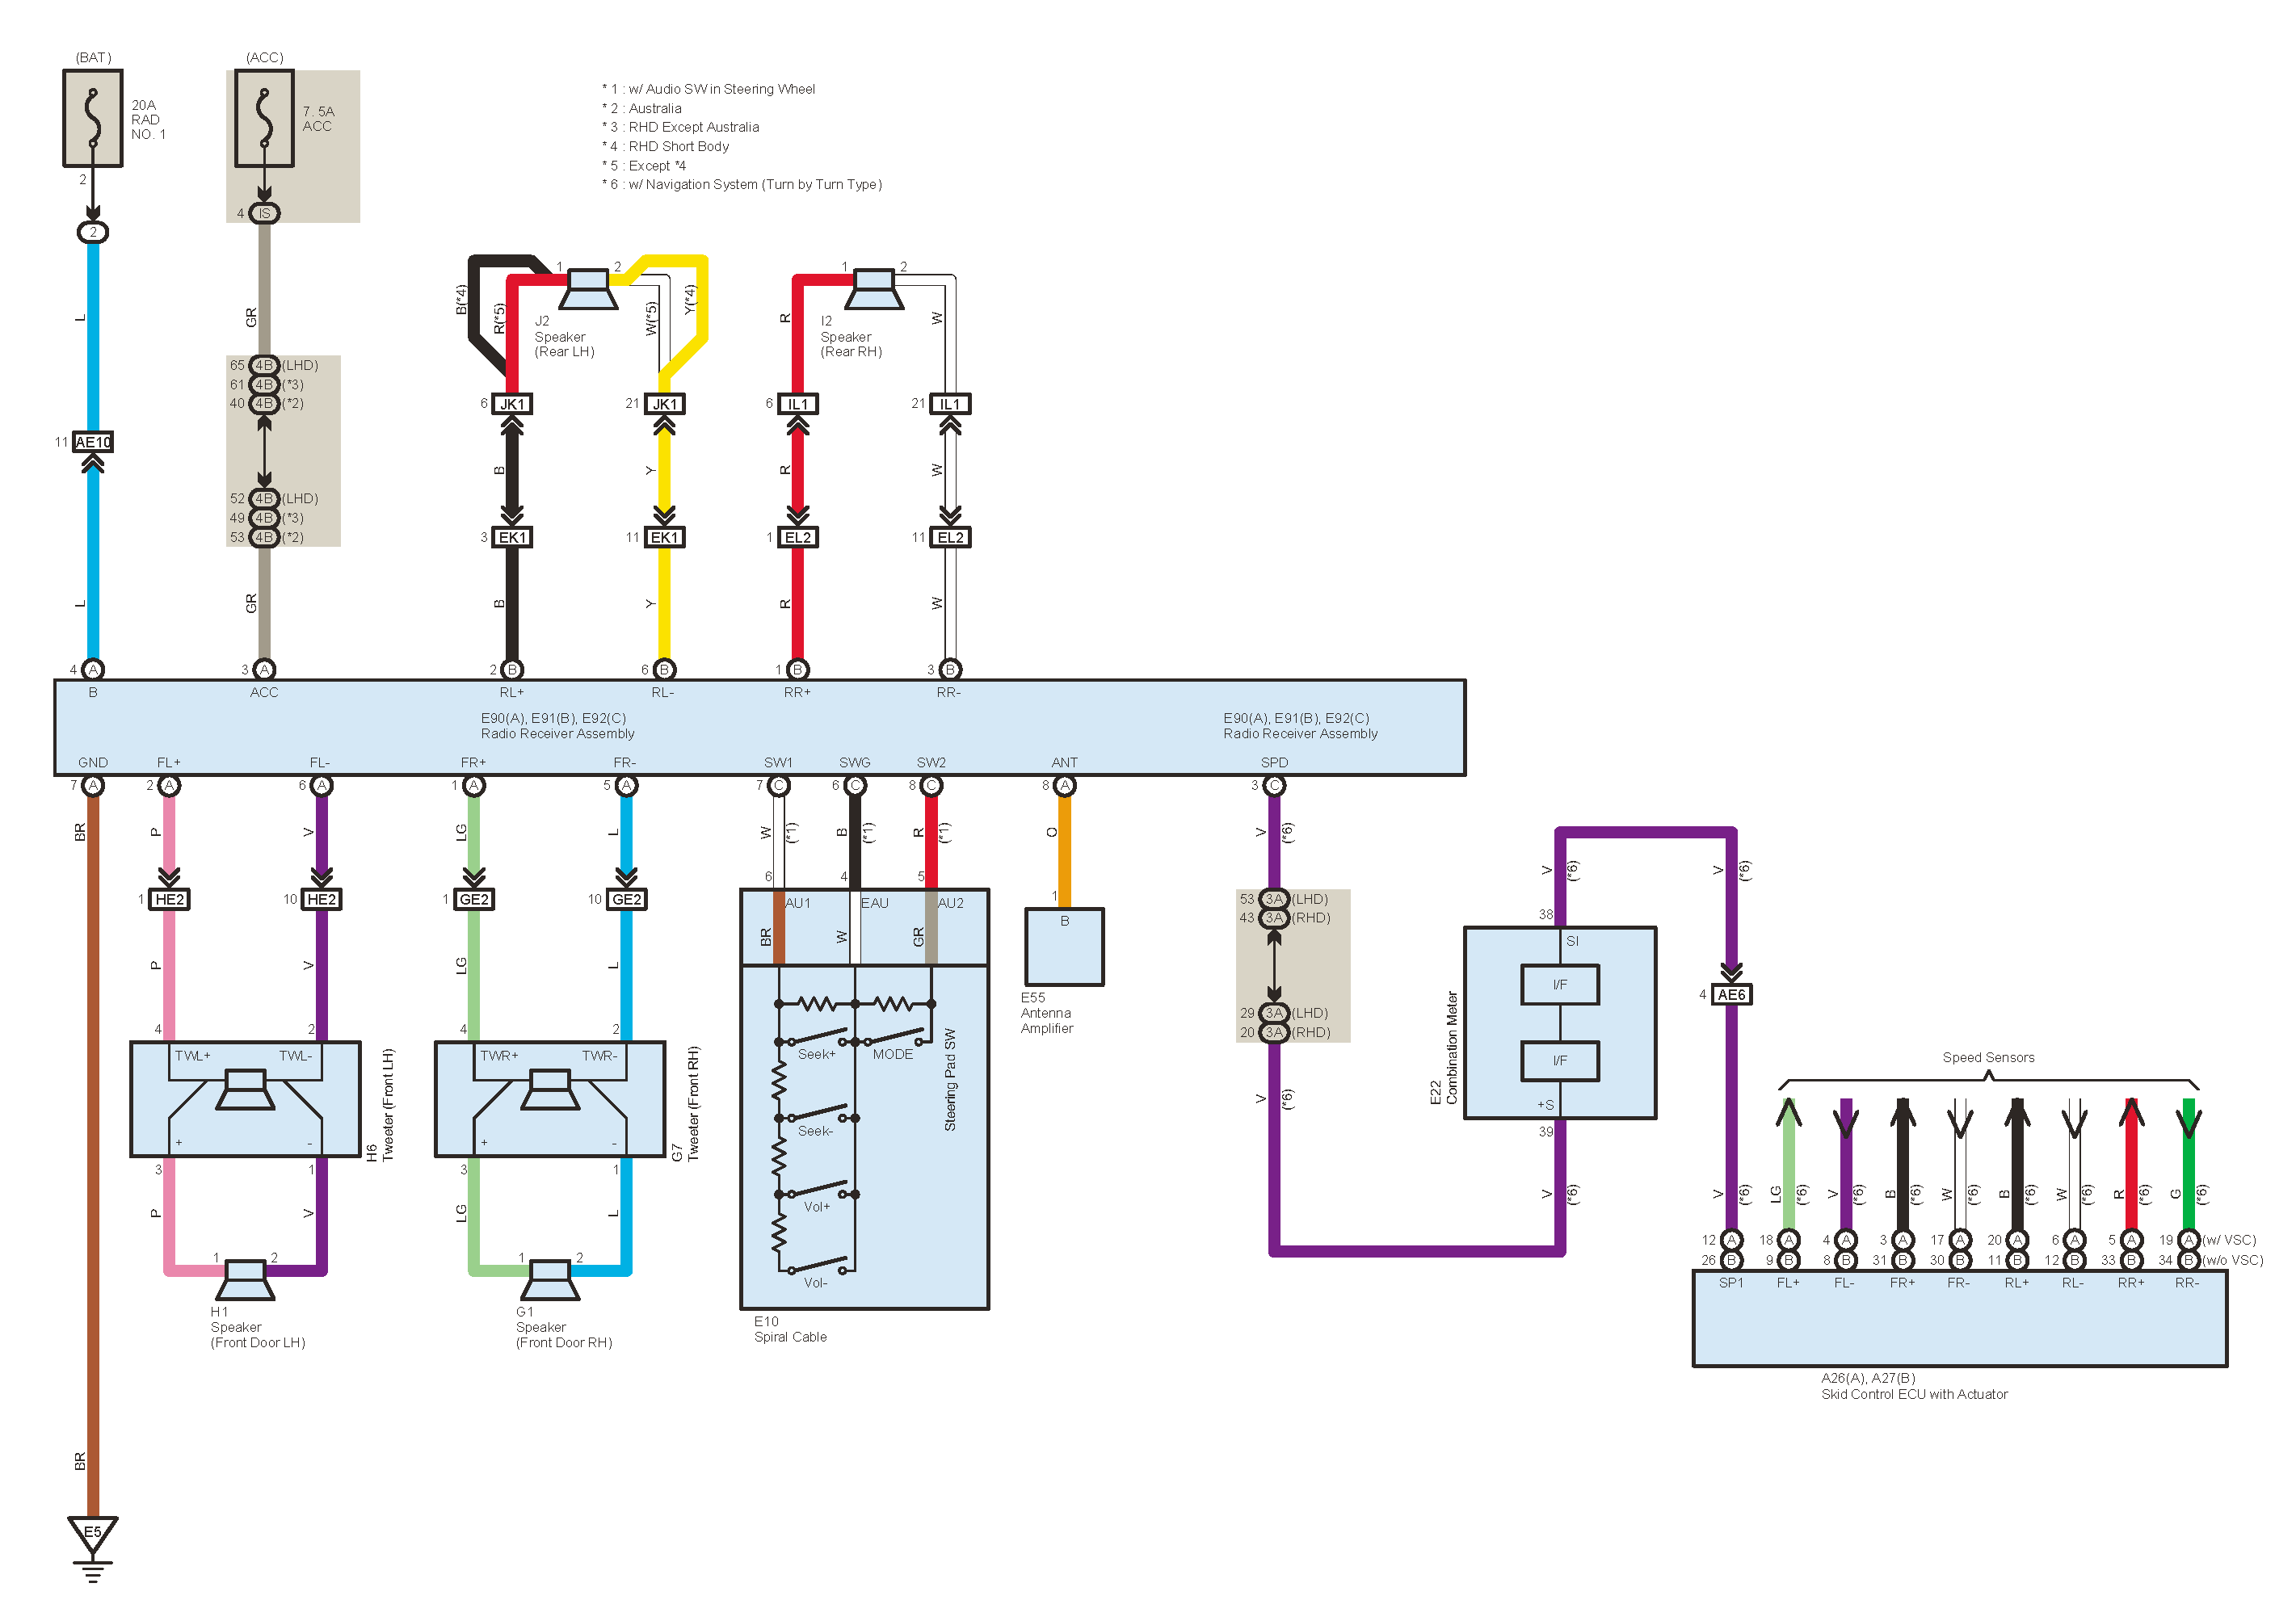 Wondrous 2001 Toyota Corolla Wiring Diagram Wiring Diagram Database Wiring Cloud Rometaidewilluminateatxorg